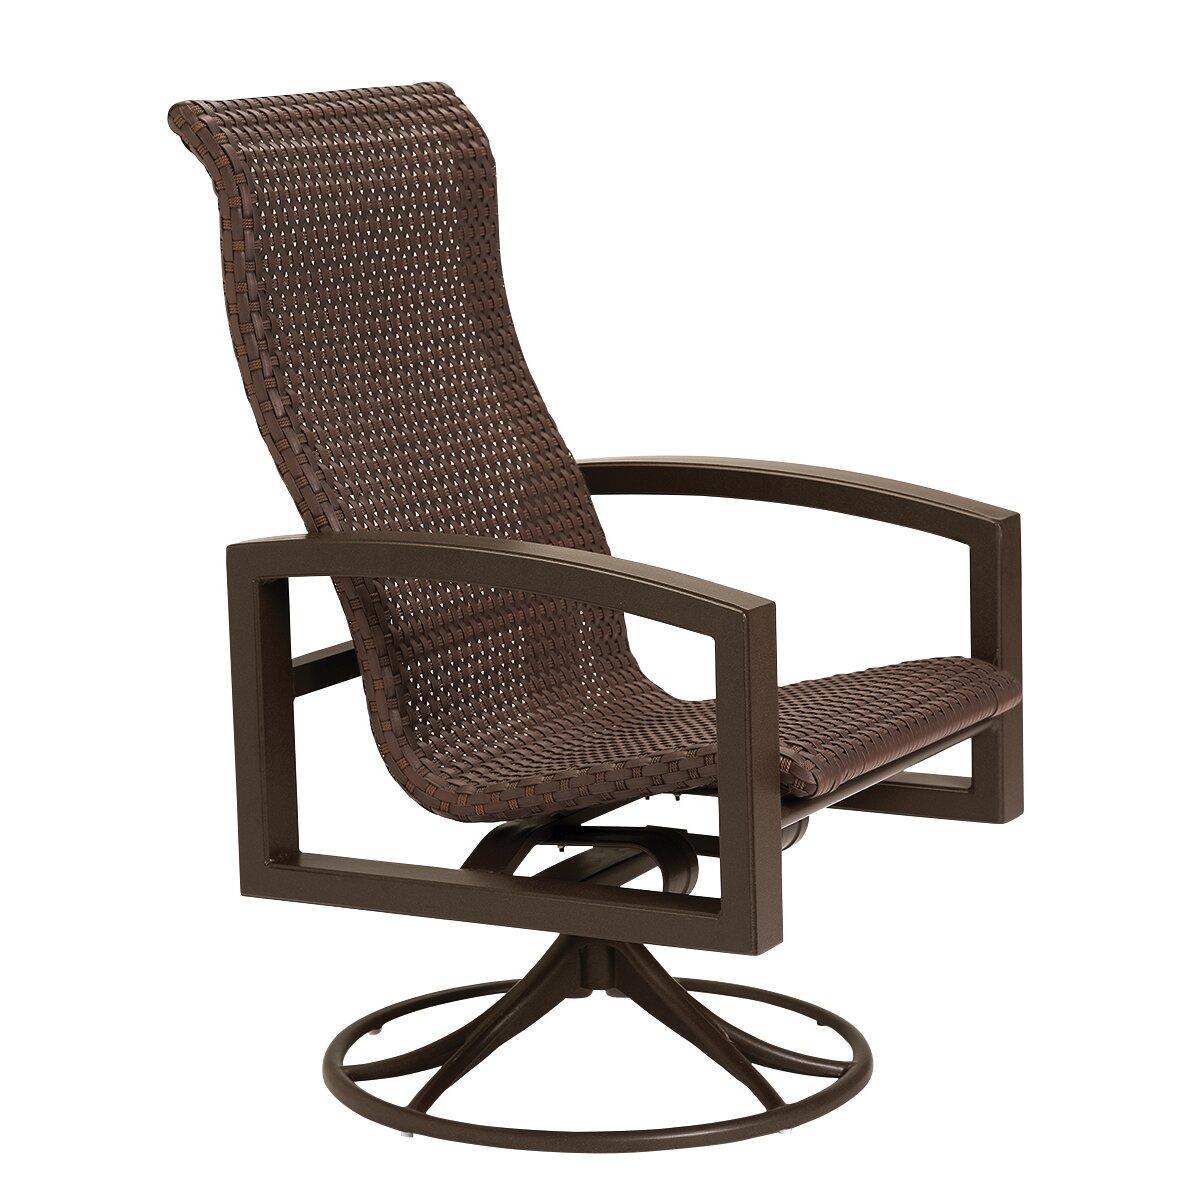 Tropitone Lakeside Woven Swivel Rocking Chair